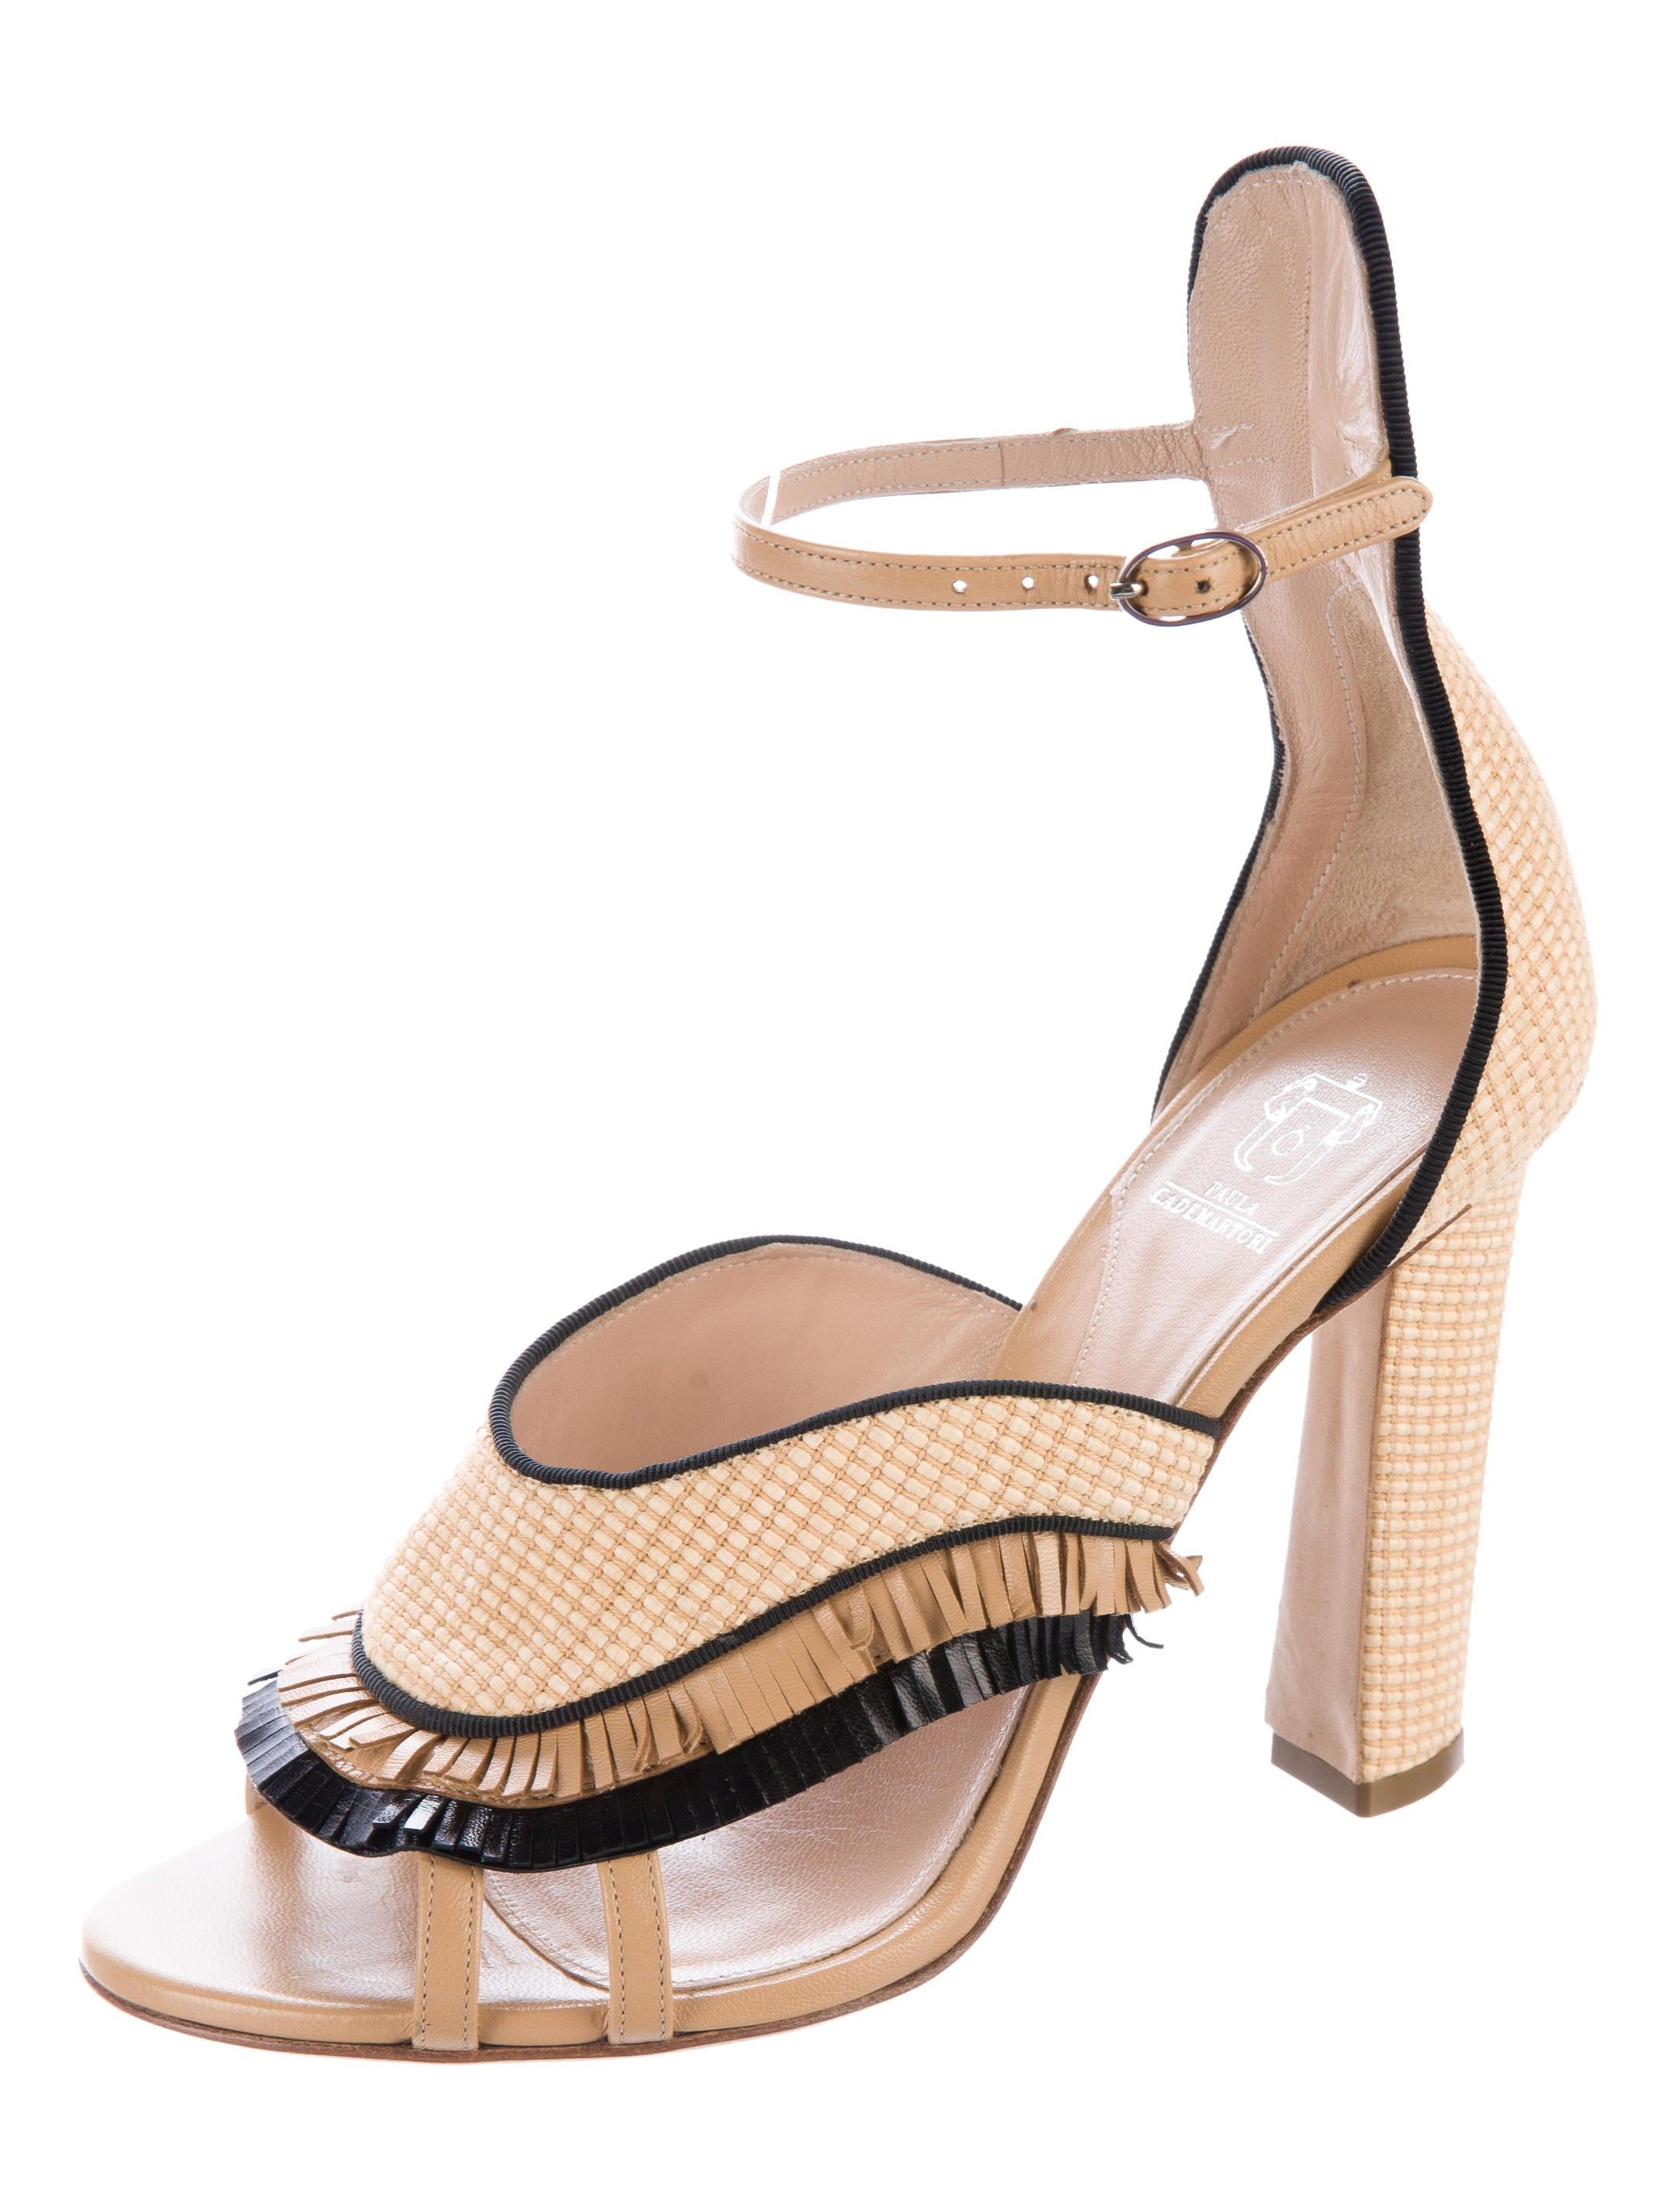 Paula Cademartori Shoes Sale